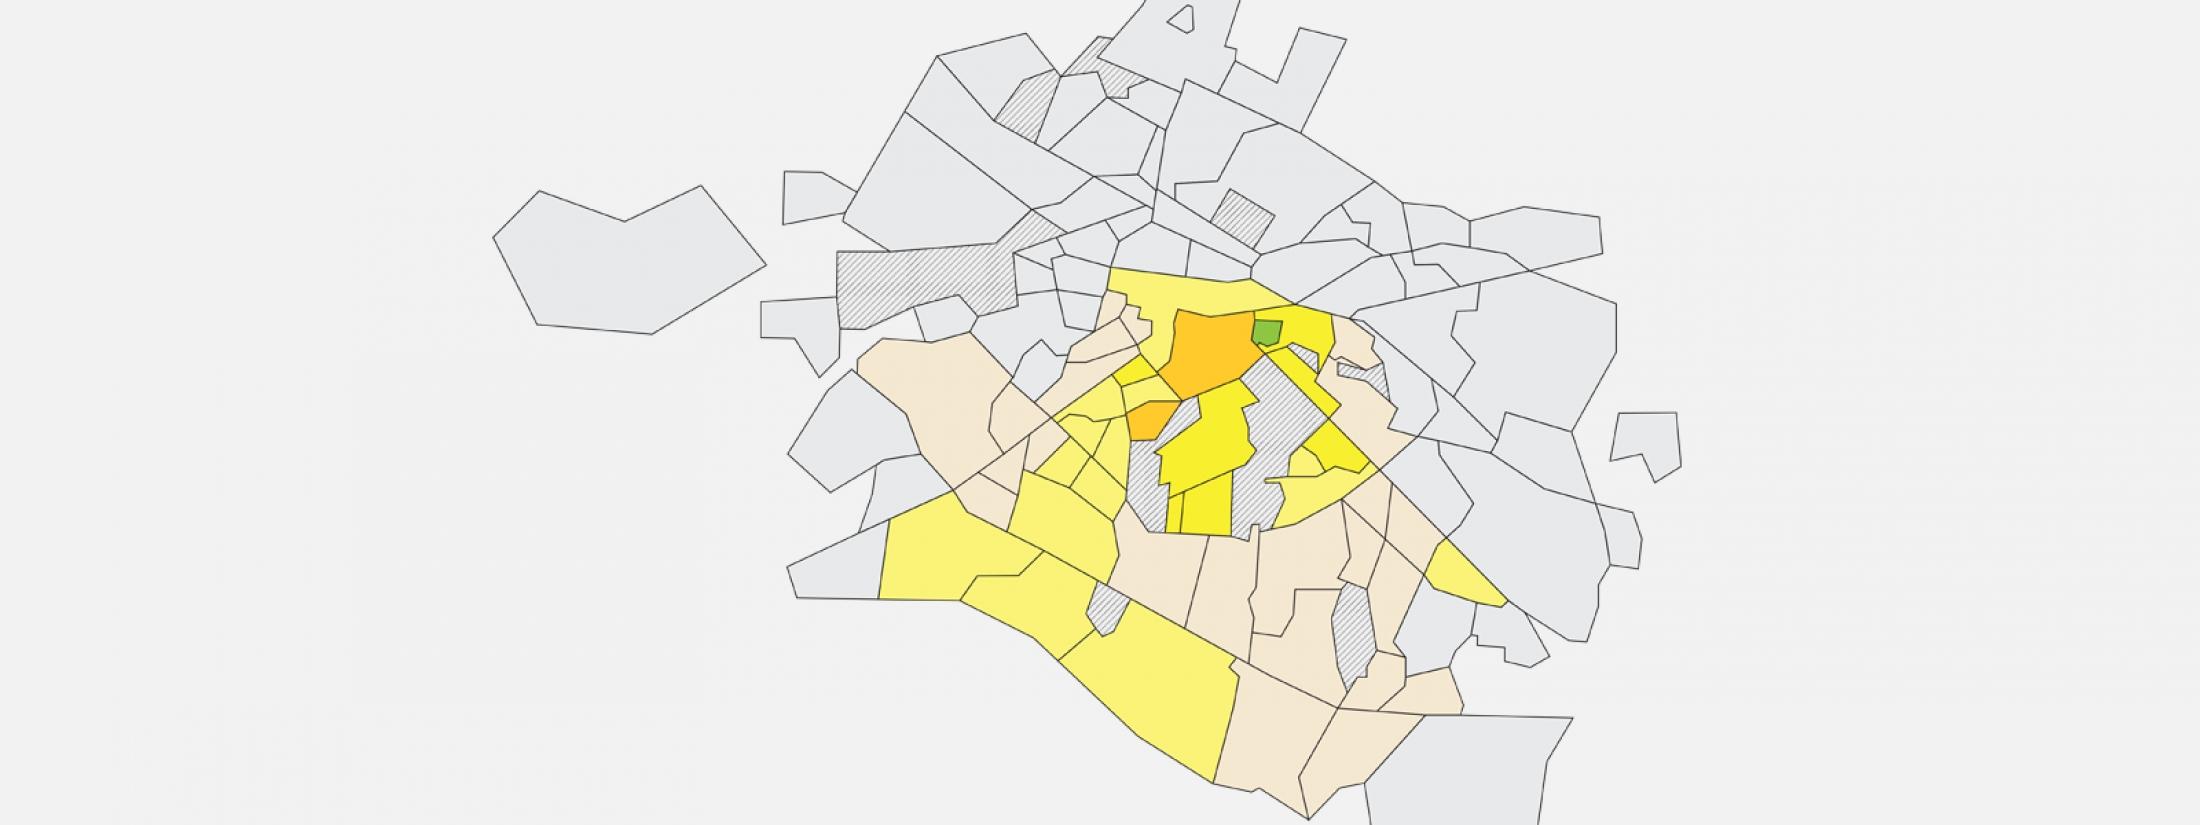 How does your neighbourhood rank?